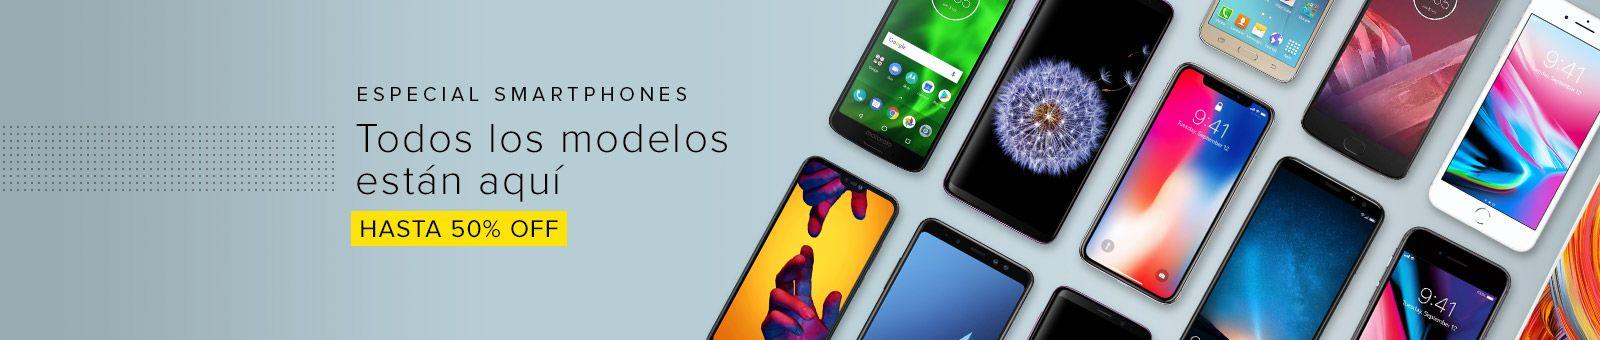 Especial smartphones